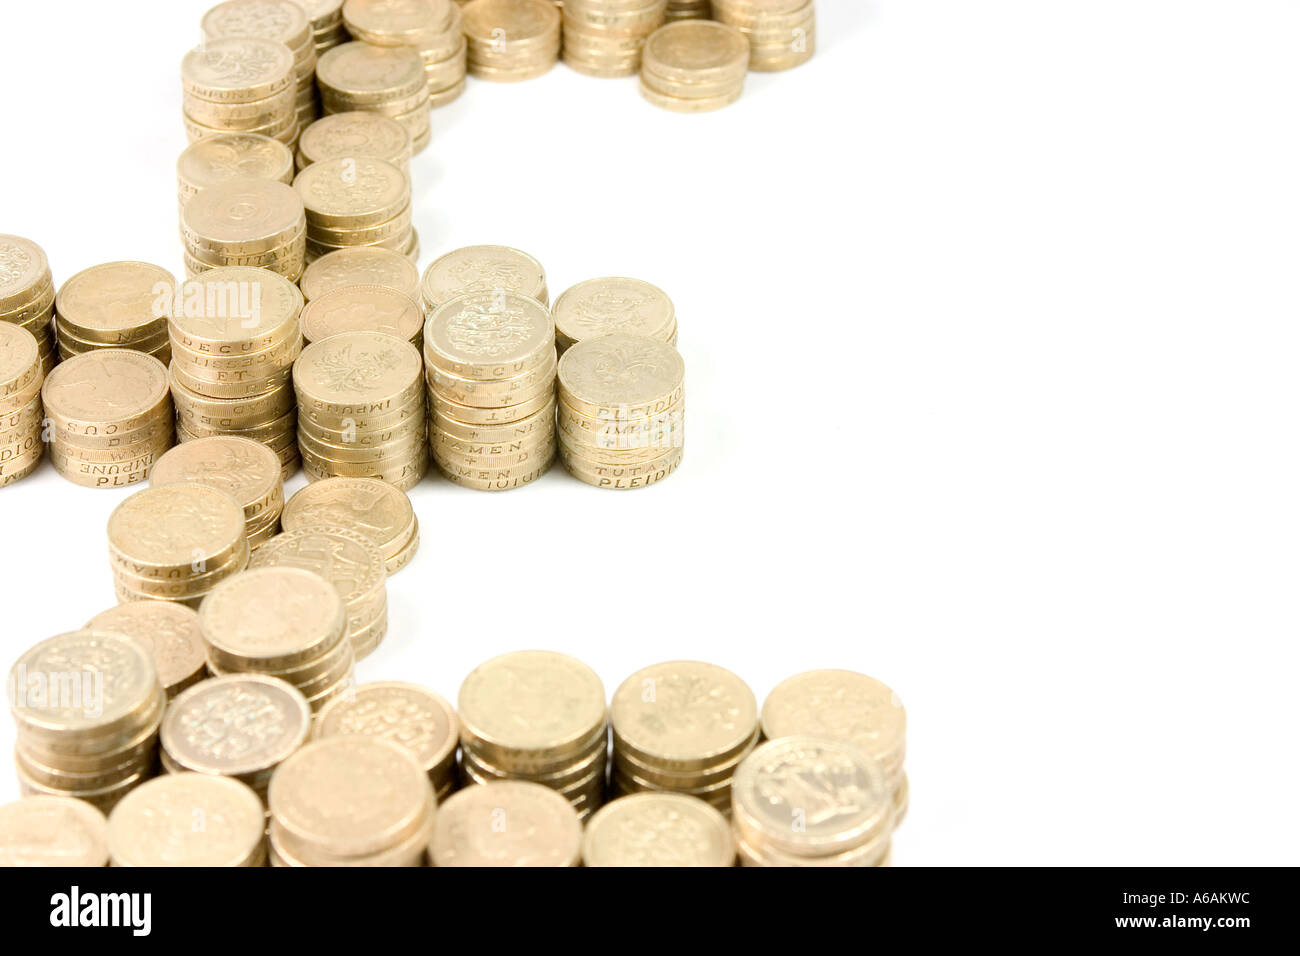 British Pound Symbol In British Pounds Stock Photo 6580443 Alamy